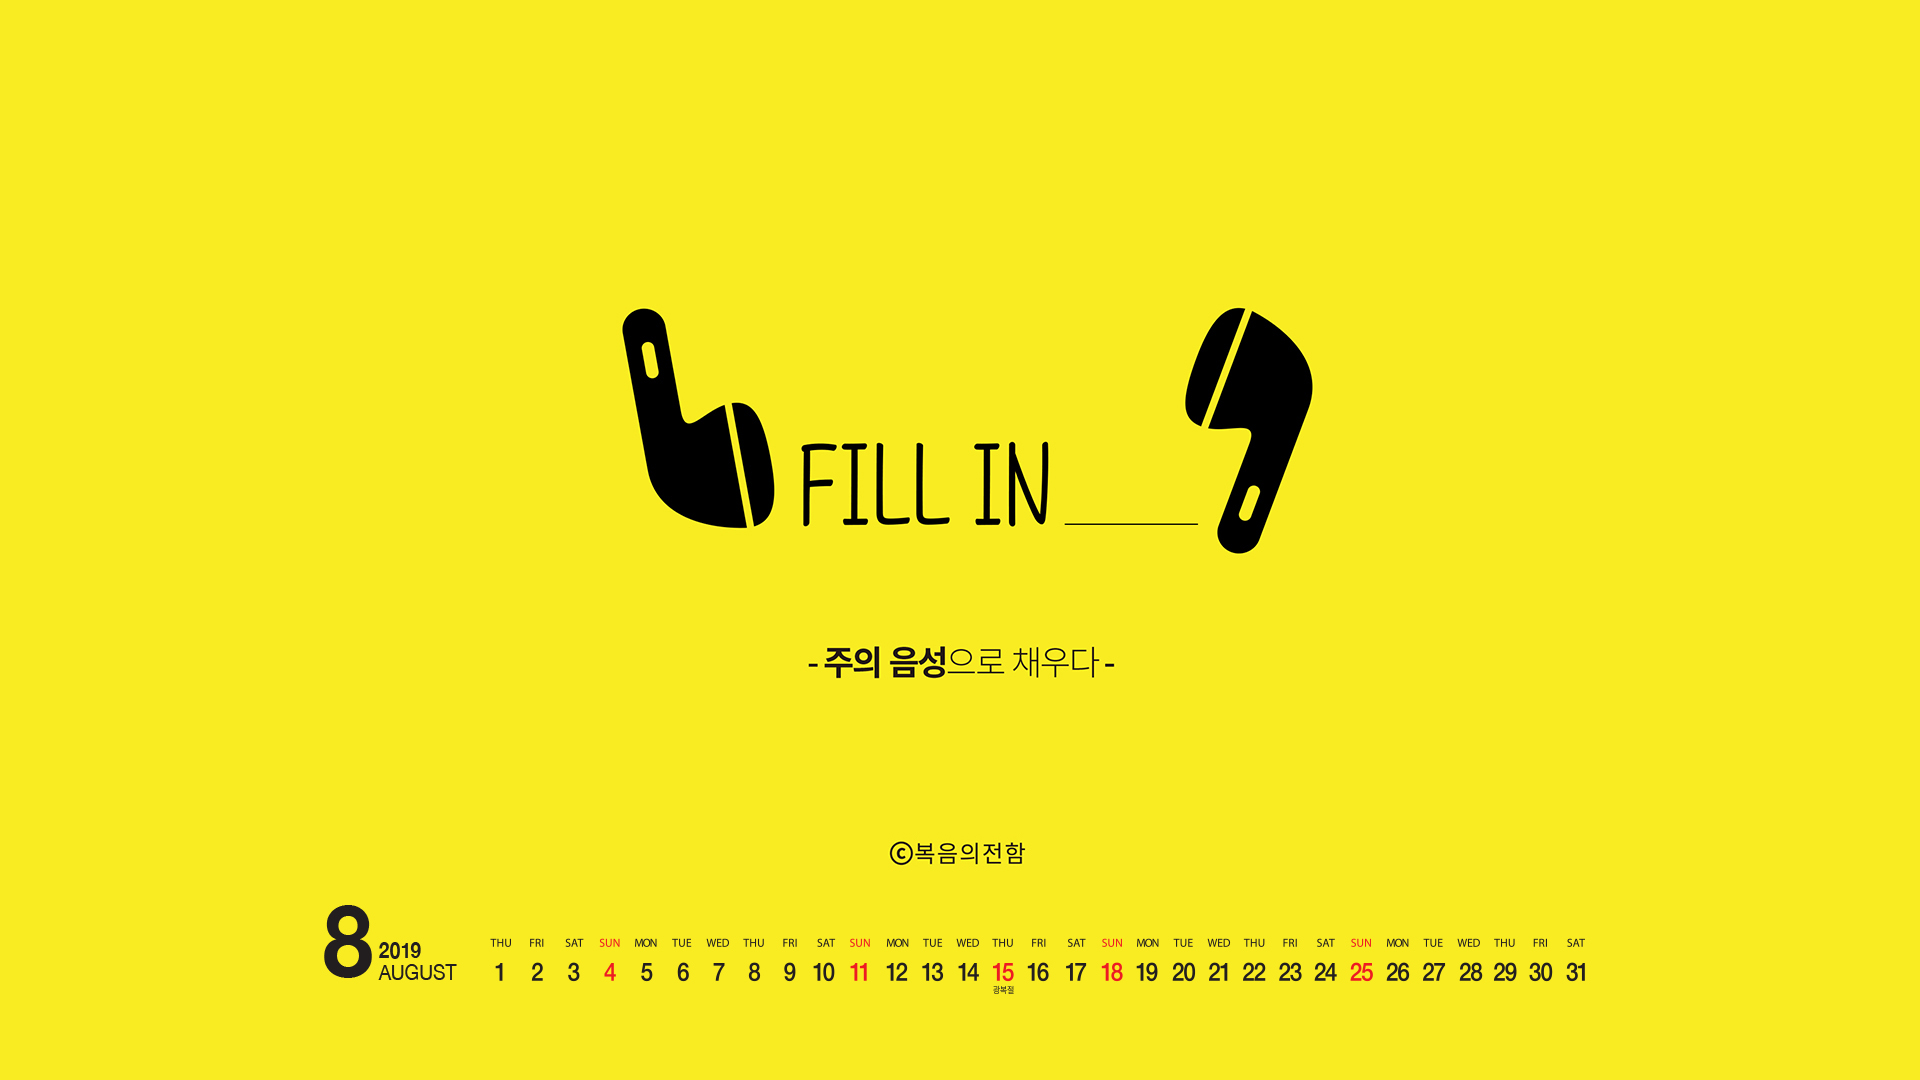 SNS복음광고8월최종_배경화면-사본.jpg